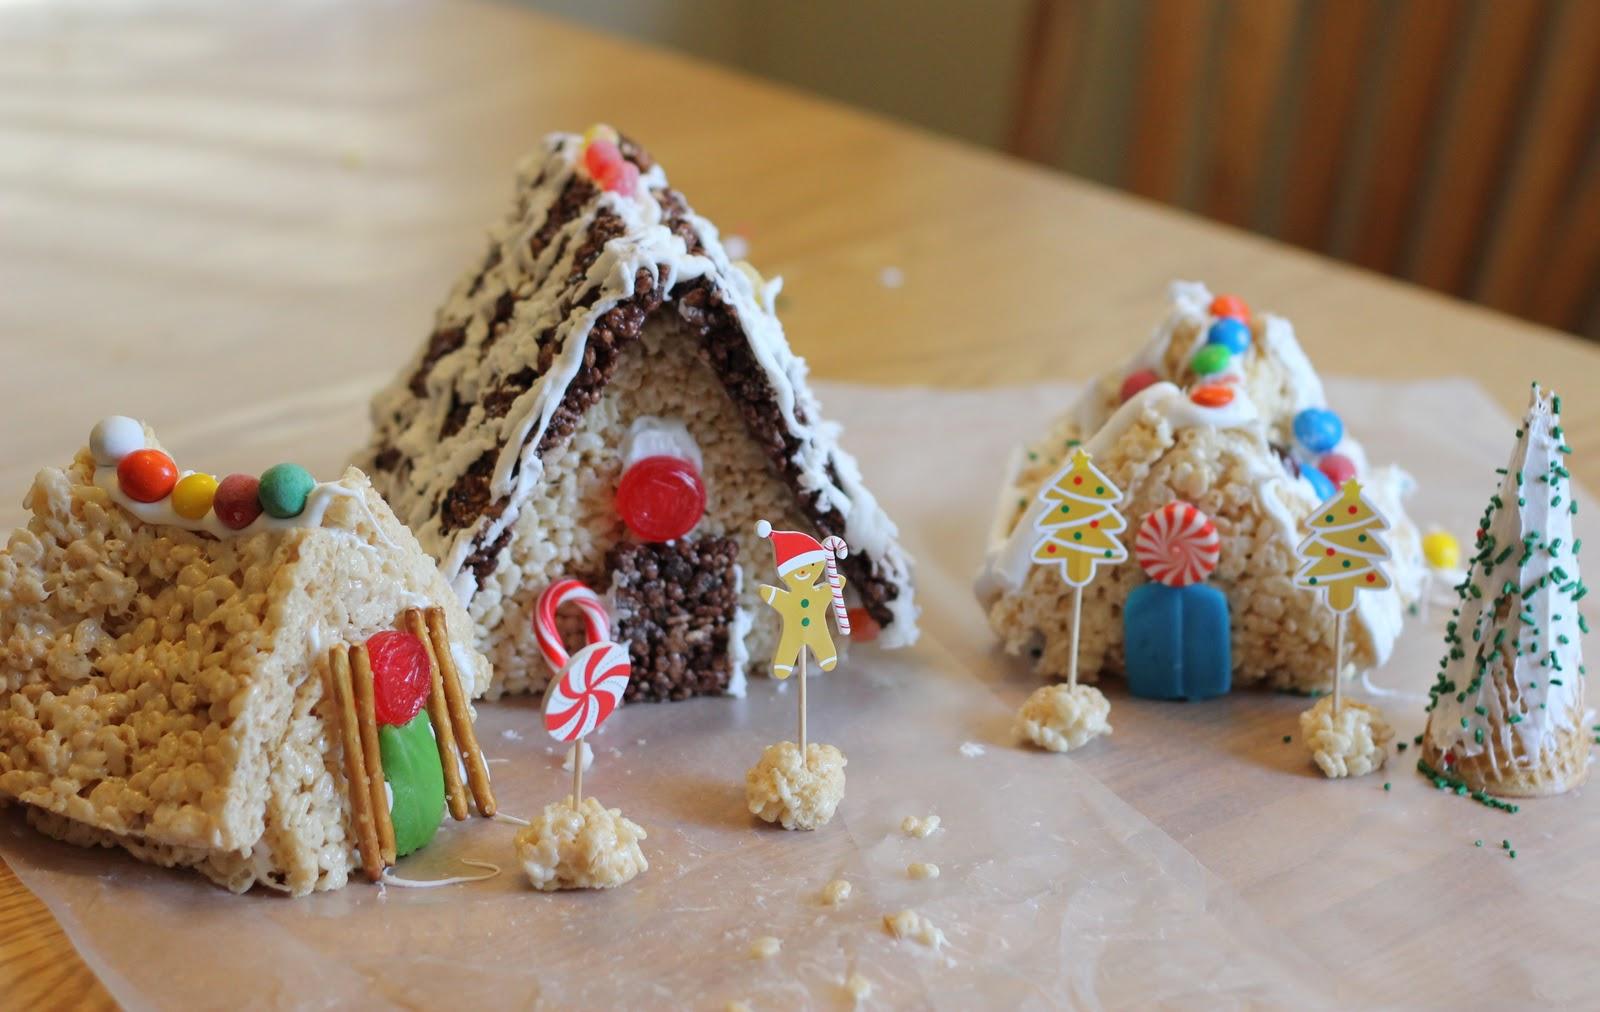 snow village gingerbread house blogs workanyware co uk u2022 rh blogs workanyware co uk